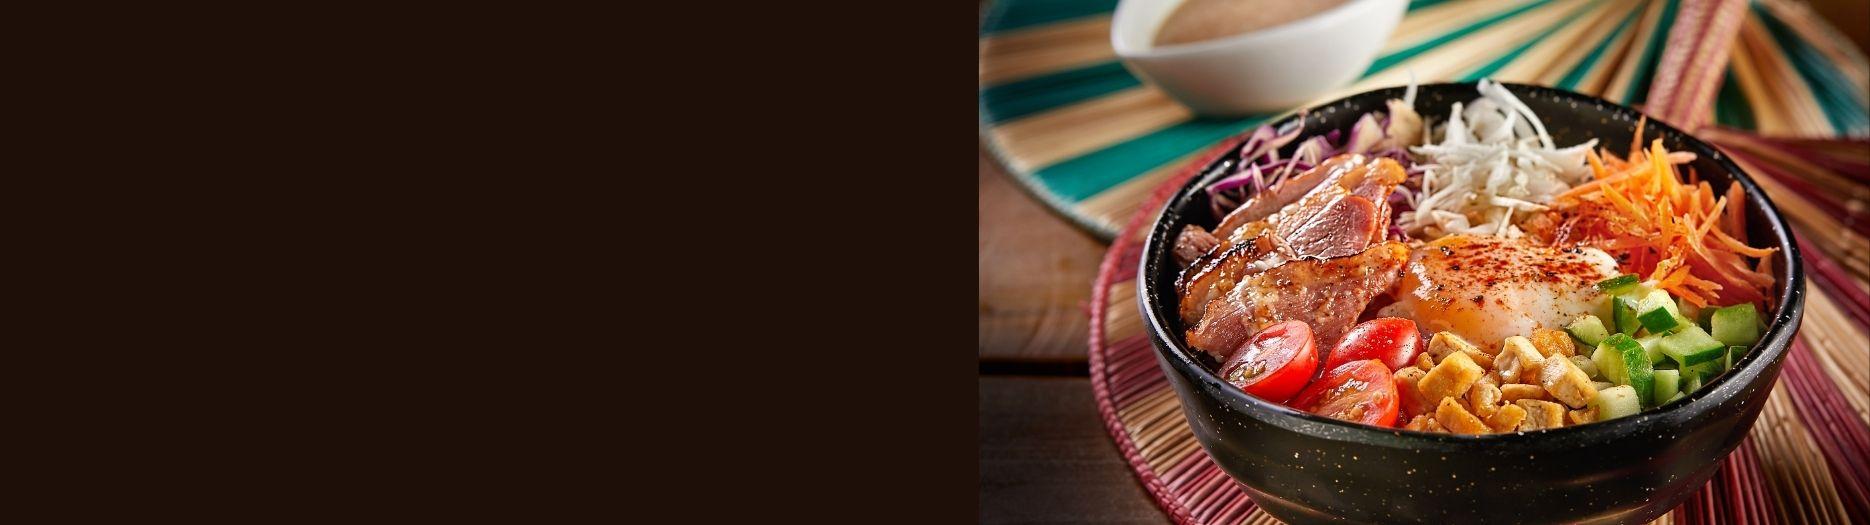 Website_1870x525_MF Old Habits Rice Bowl